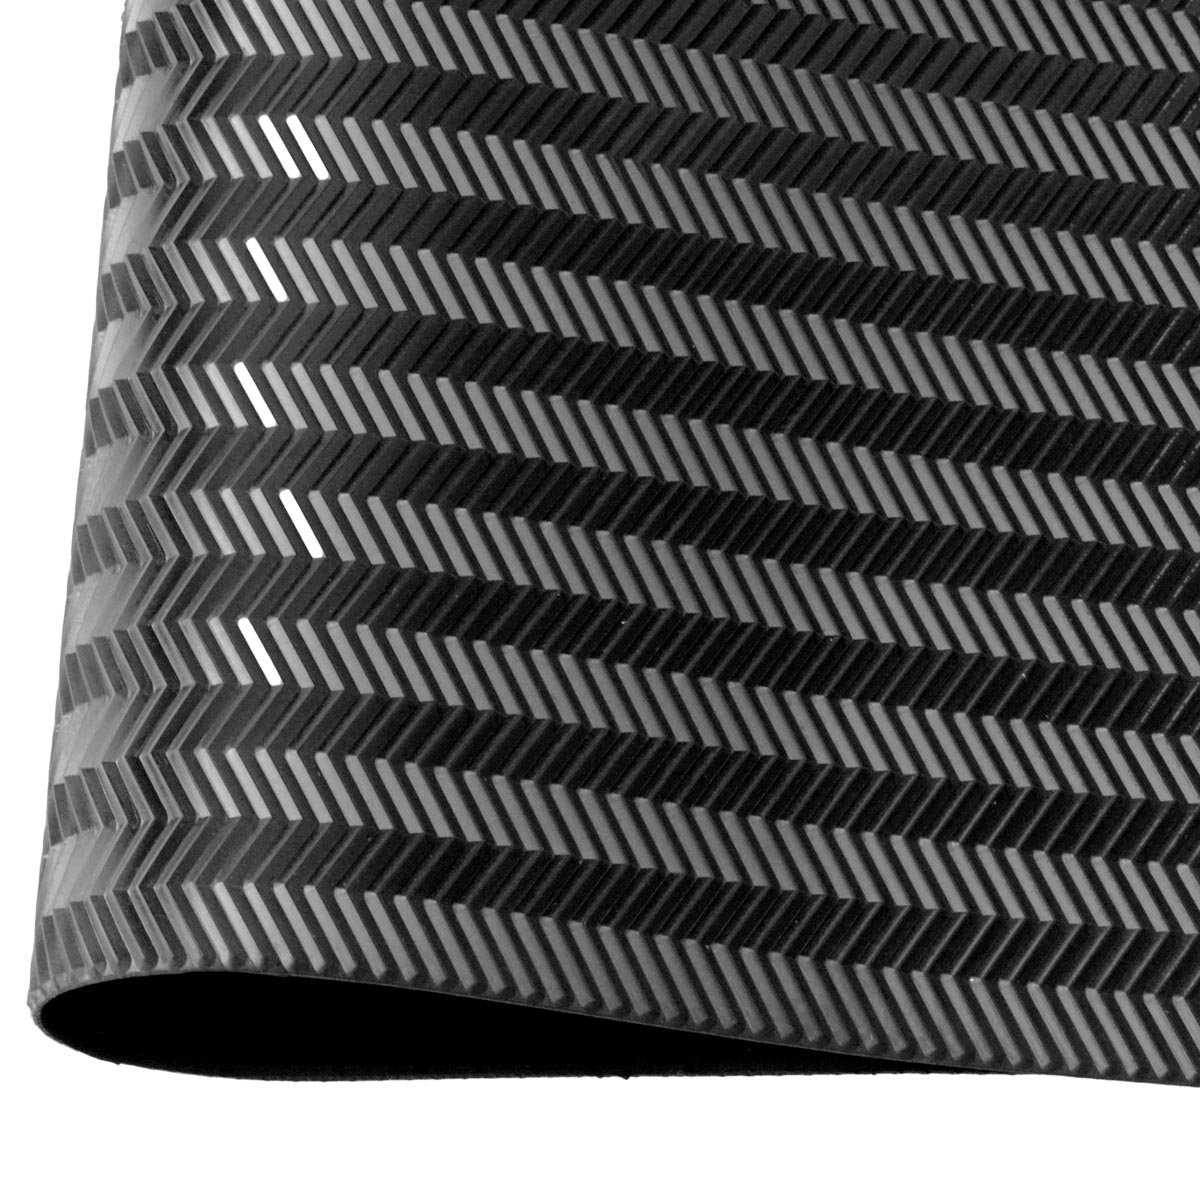 Black shoe rubber soling sheet - 1/8'' thickness Shoe soles repairing rubber sheet. Shoes bottom repairing material by EZ ShoePAD (Image #1)